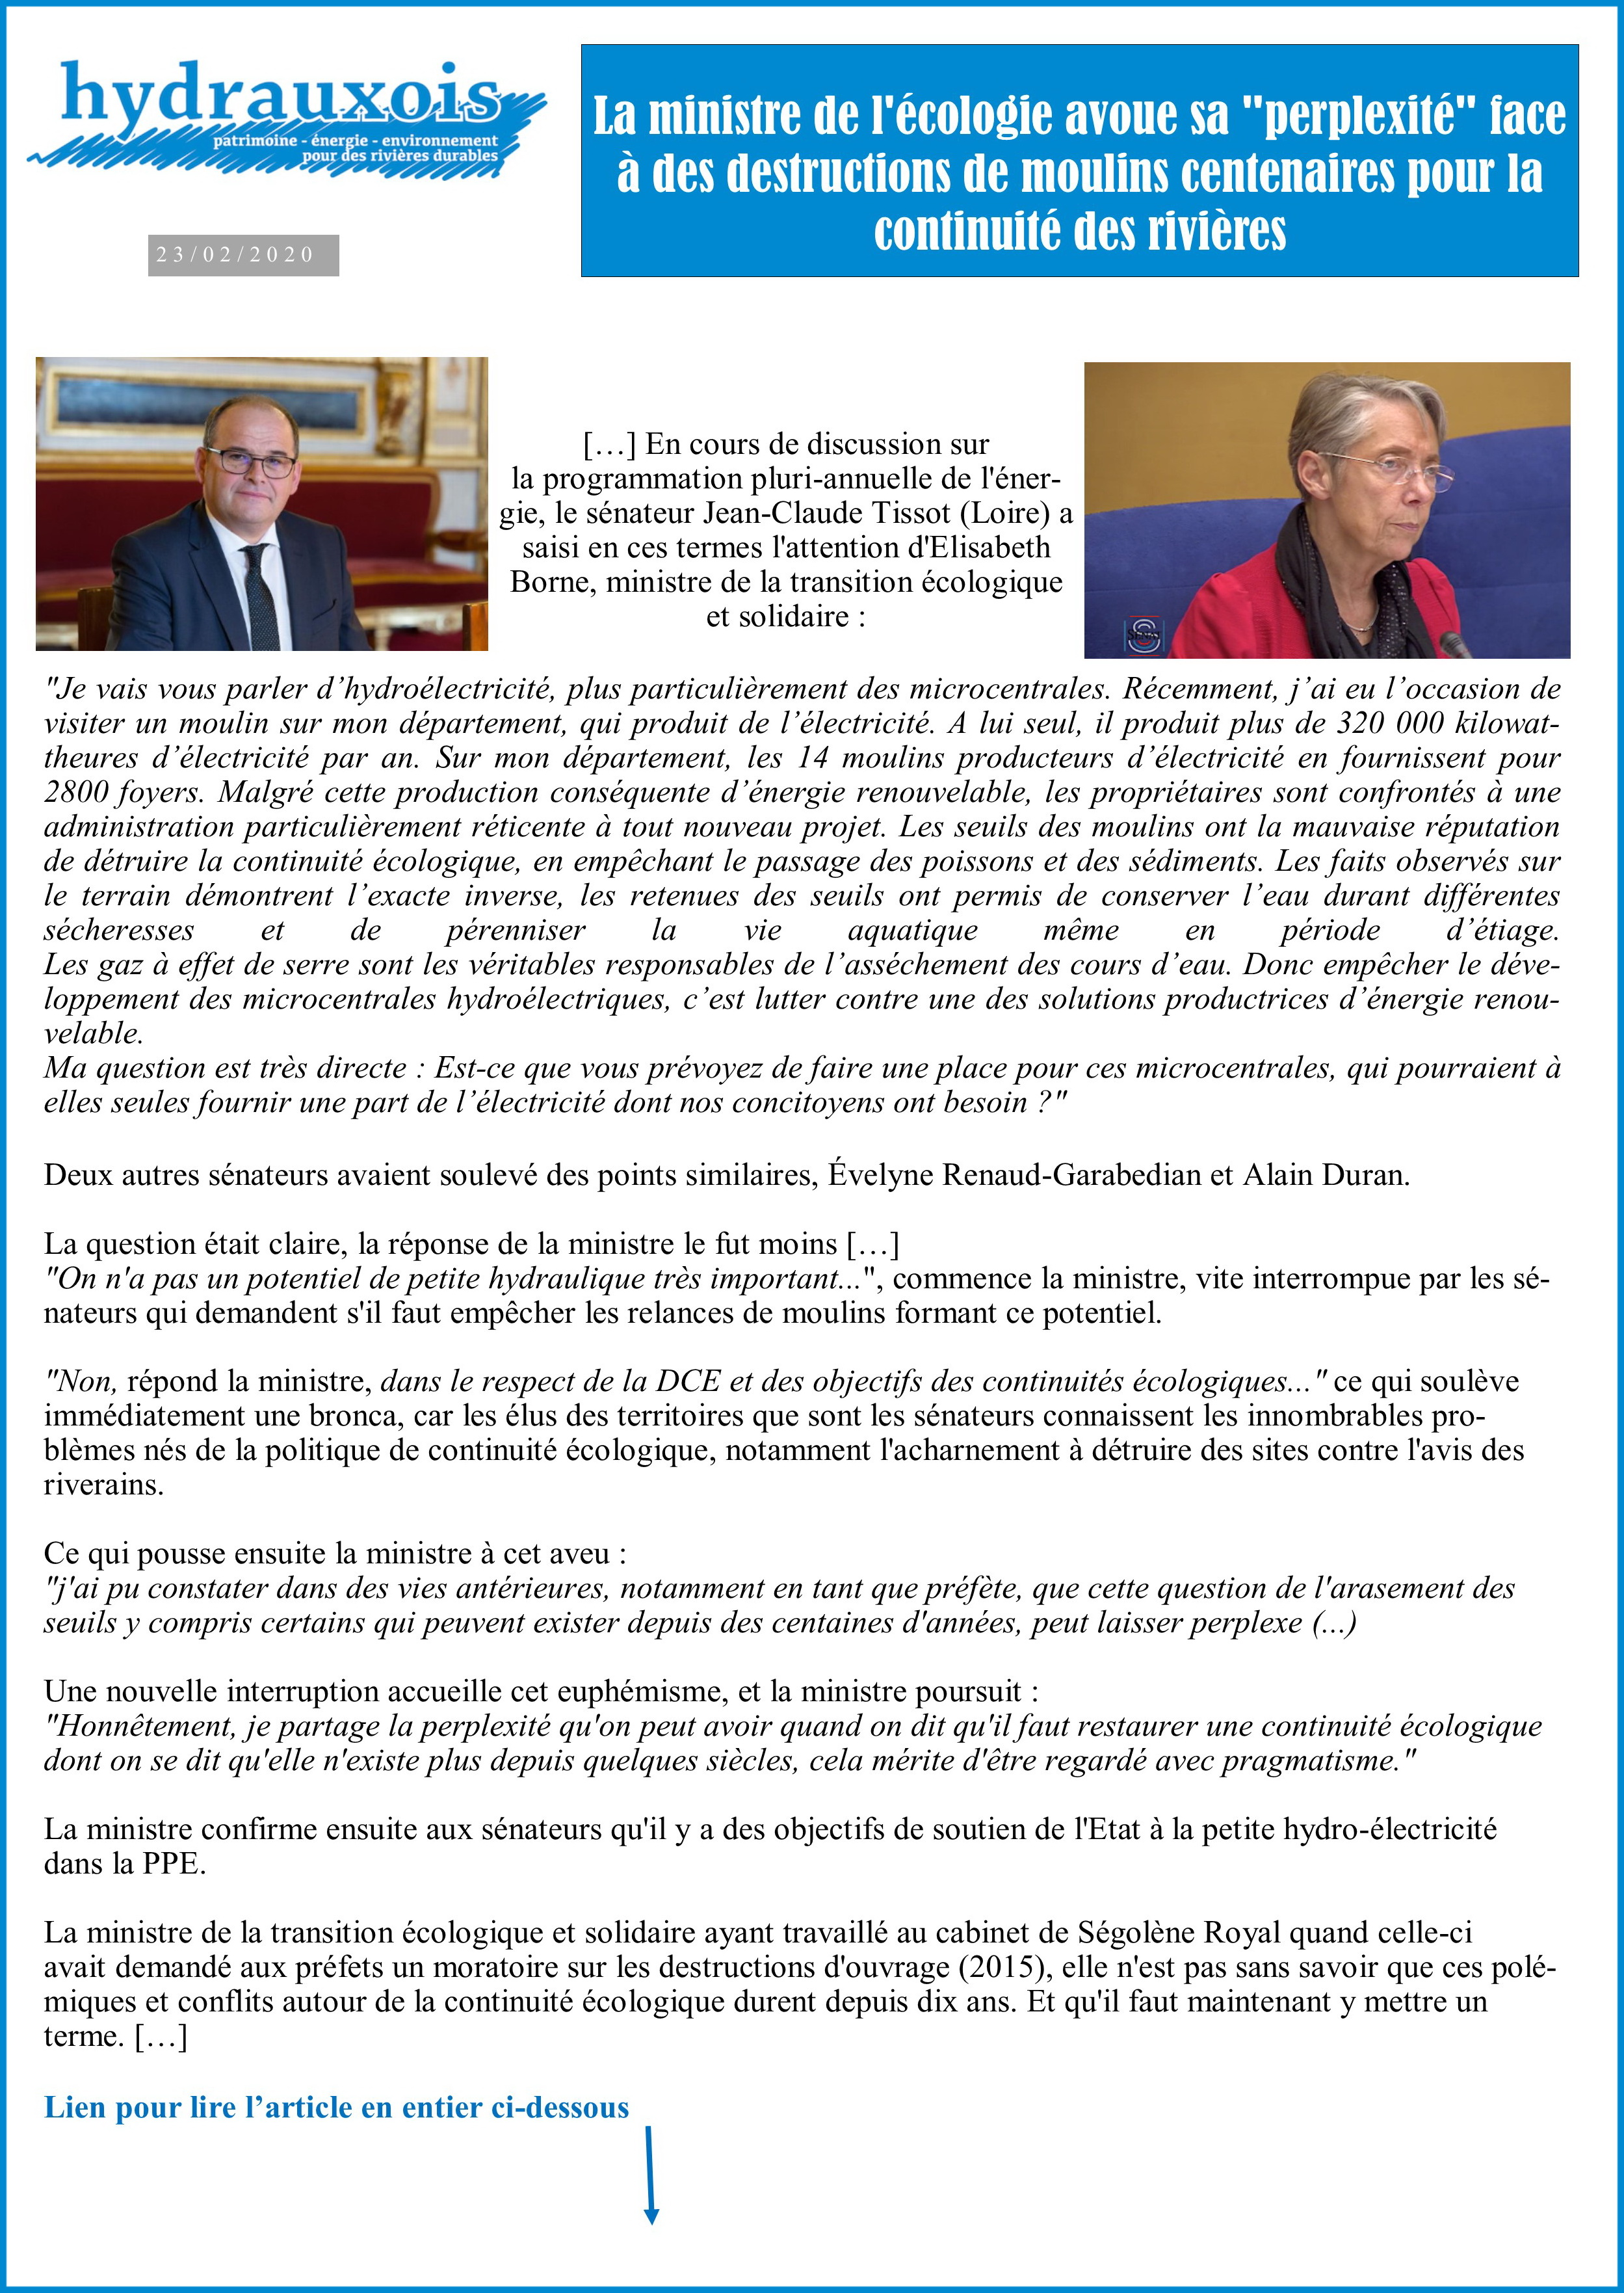 Sénateur JC Tissot interroge E. Borne